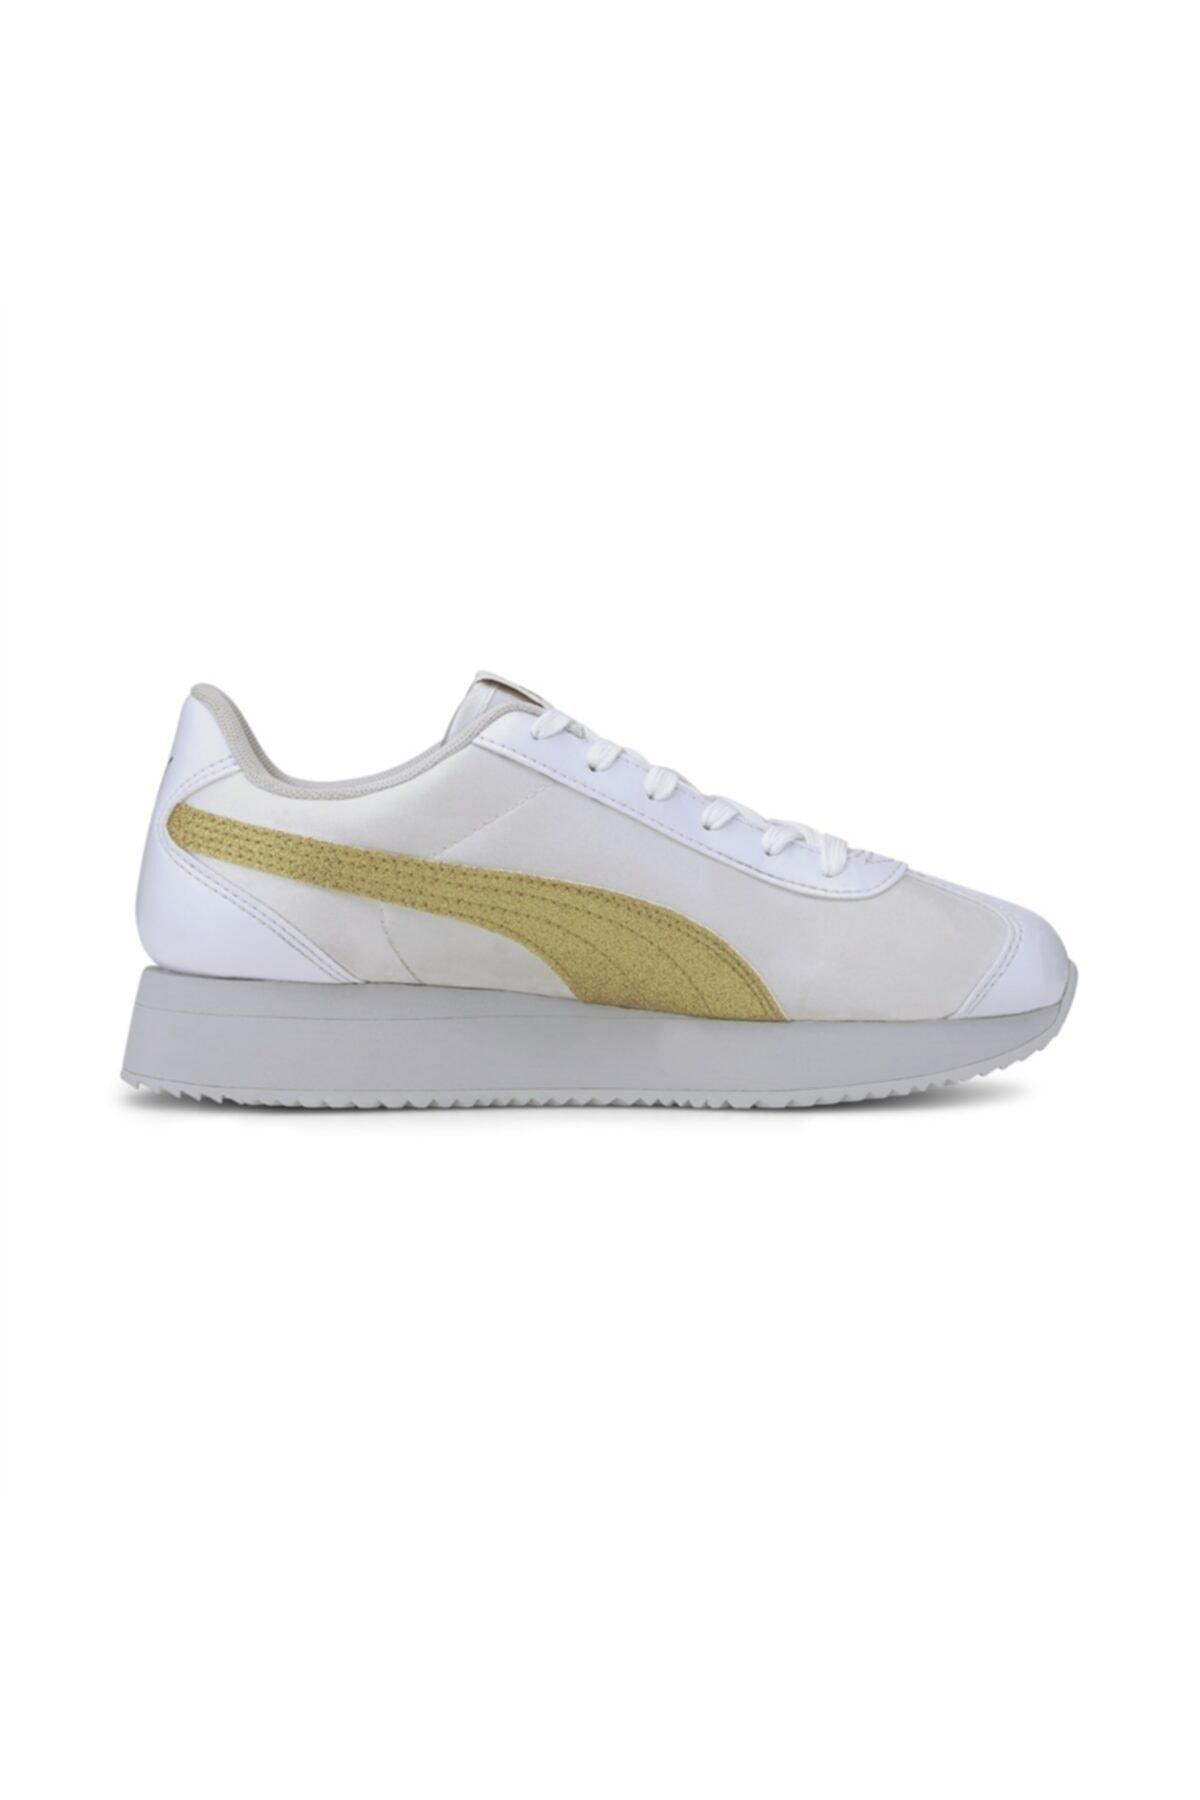 Puma Turino Stacked Glitter P Kadın Günlük Ayakkabı - 37194406 2